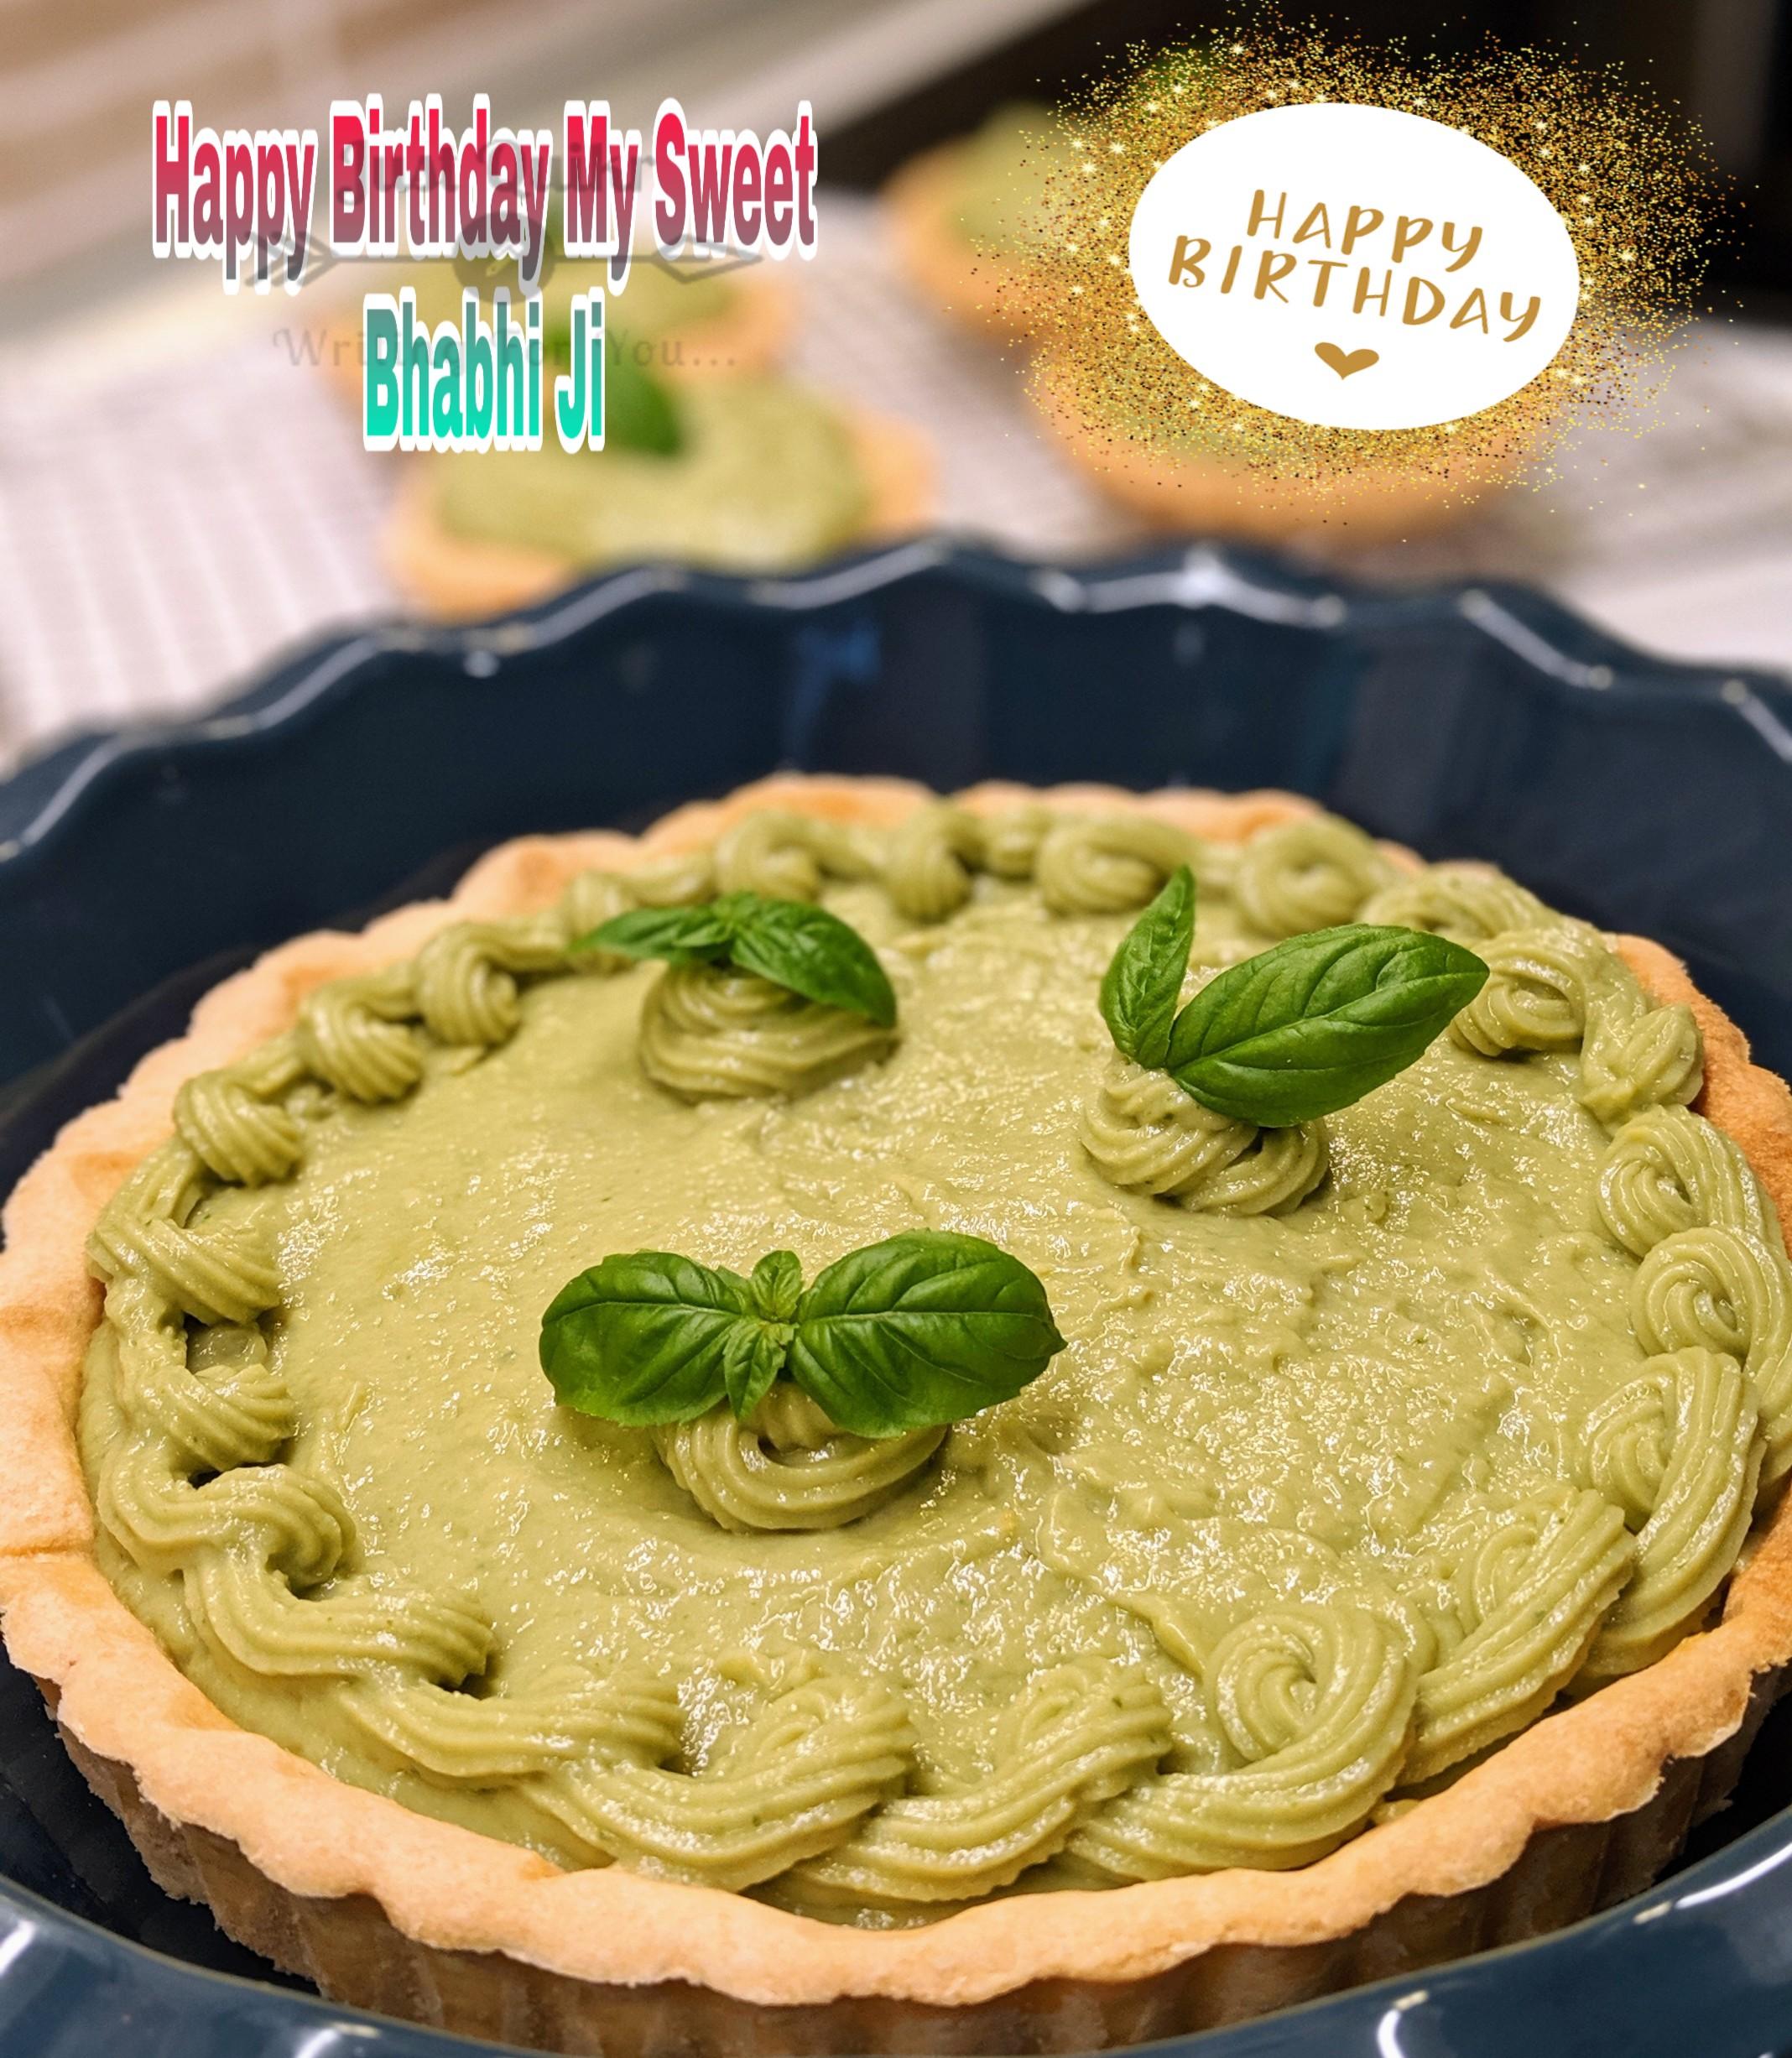 Special Unique Happy Birthday Cake HD Pics Images for Bhabhi Ji